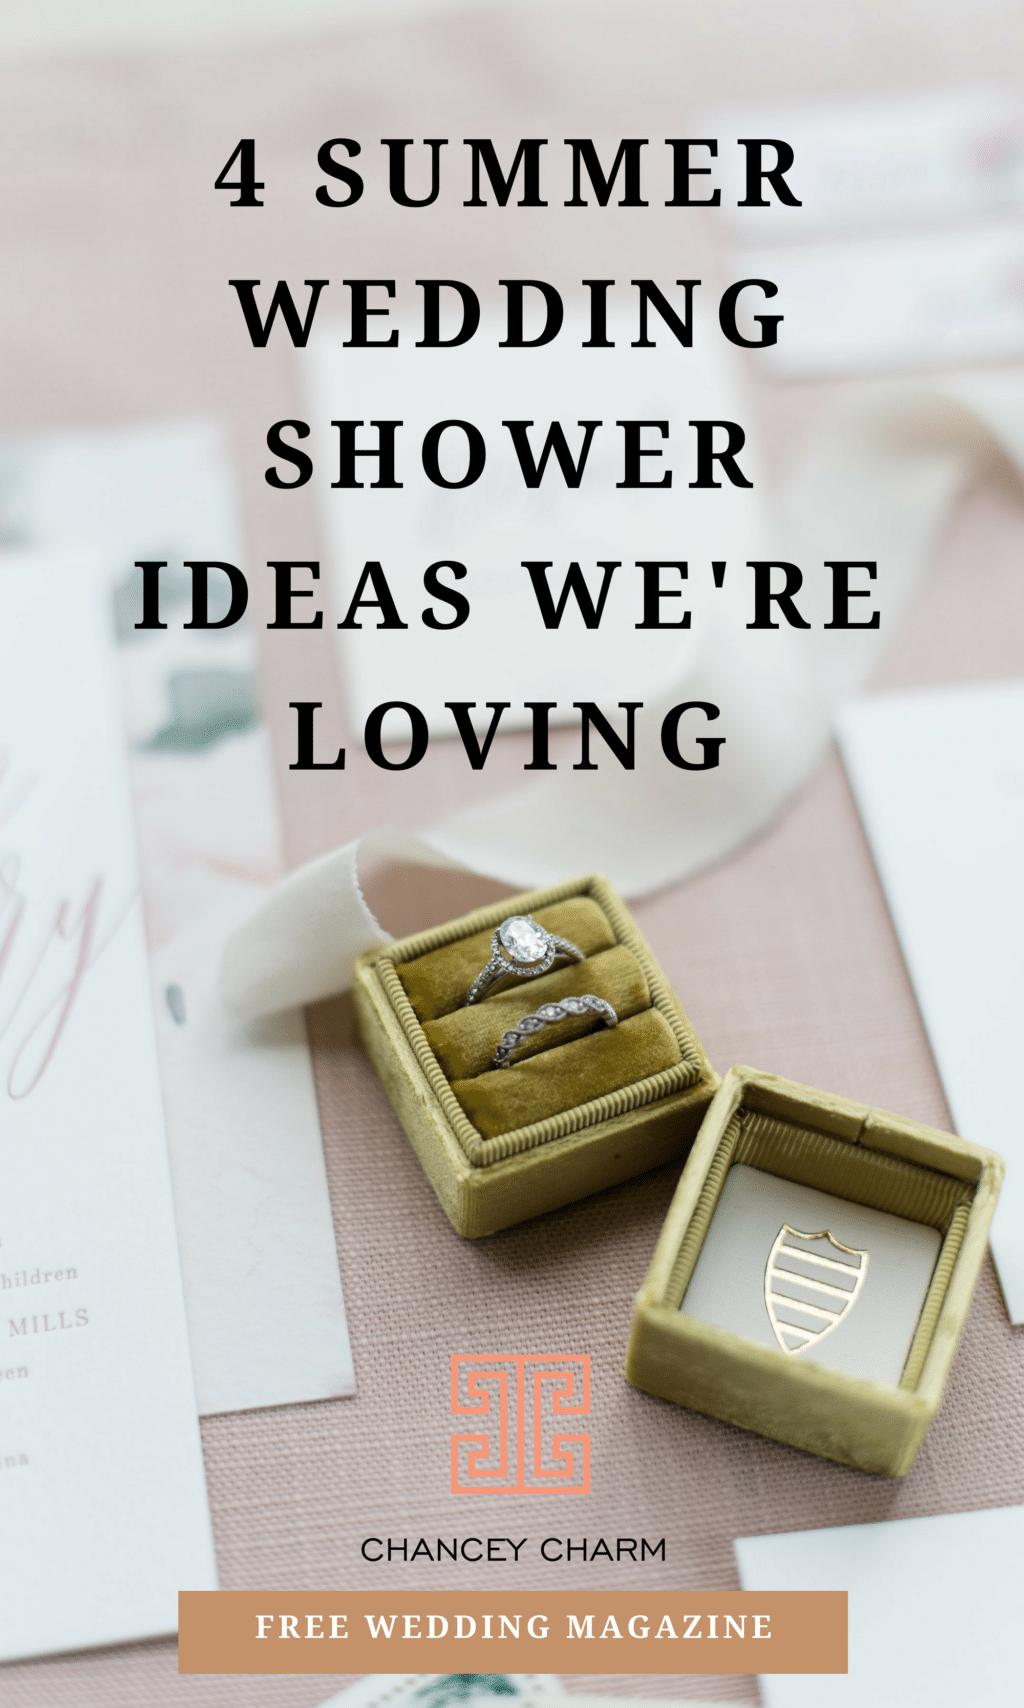 We're sharing summer wedding shower ideas we're loving this year + access to our FREE Wedding Planning Magazine! #weddingplanninganddesign #howtoplanyourwedding #weddingplanningtools #chanceycharm #summerweddingshower